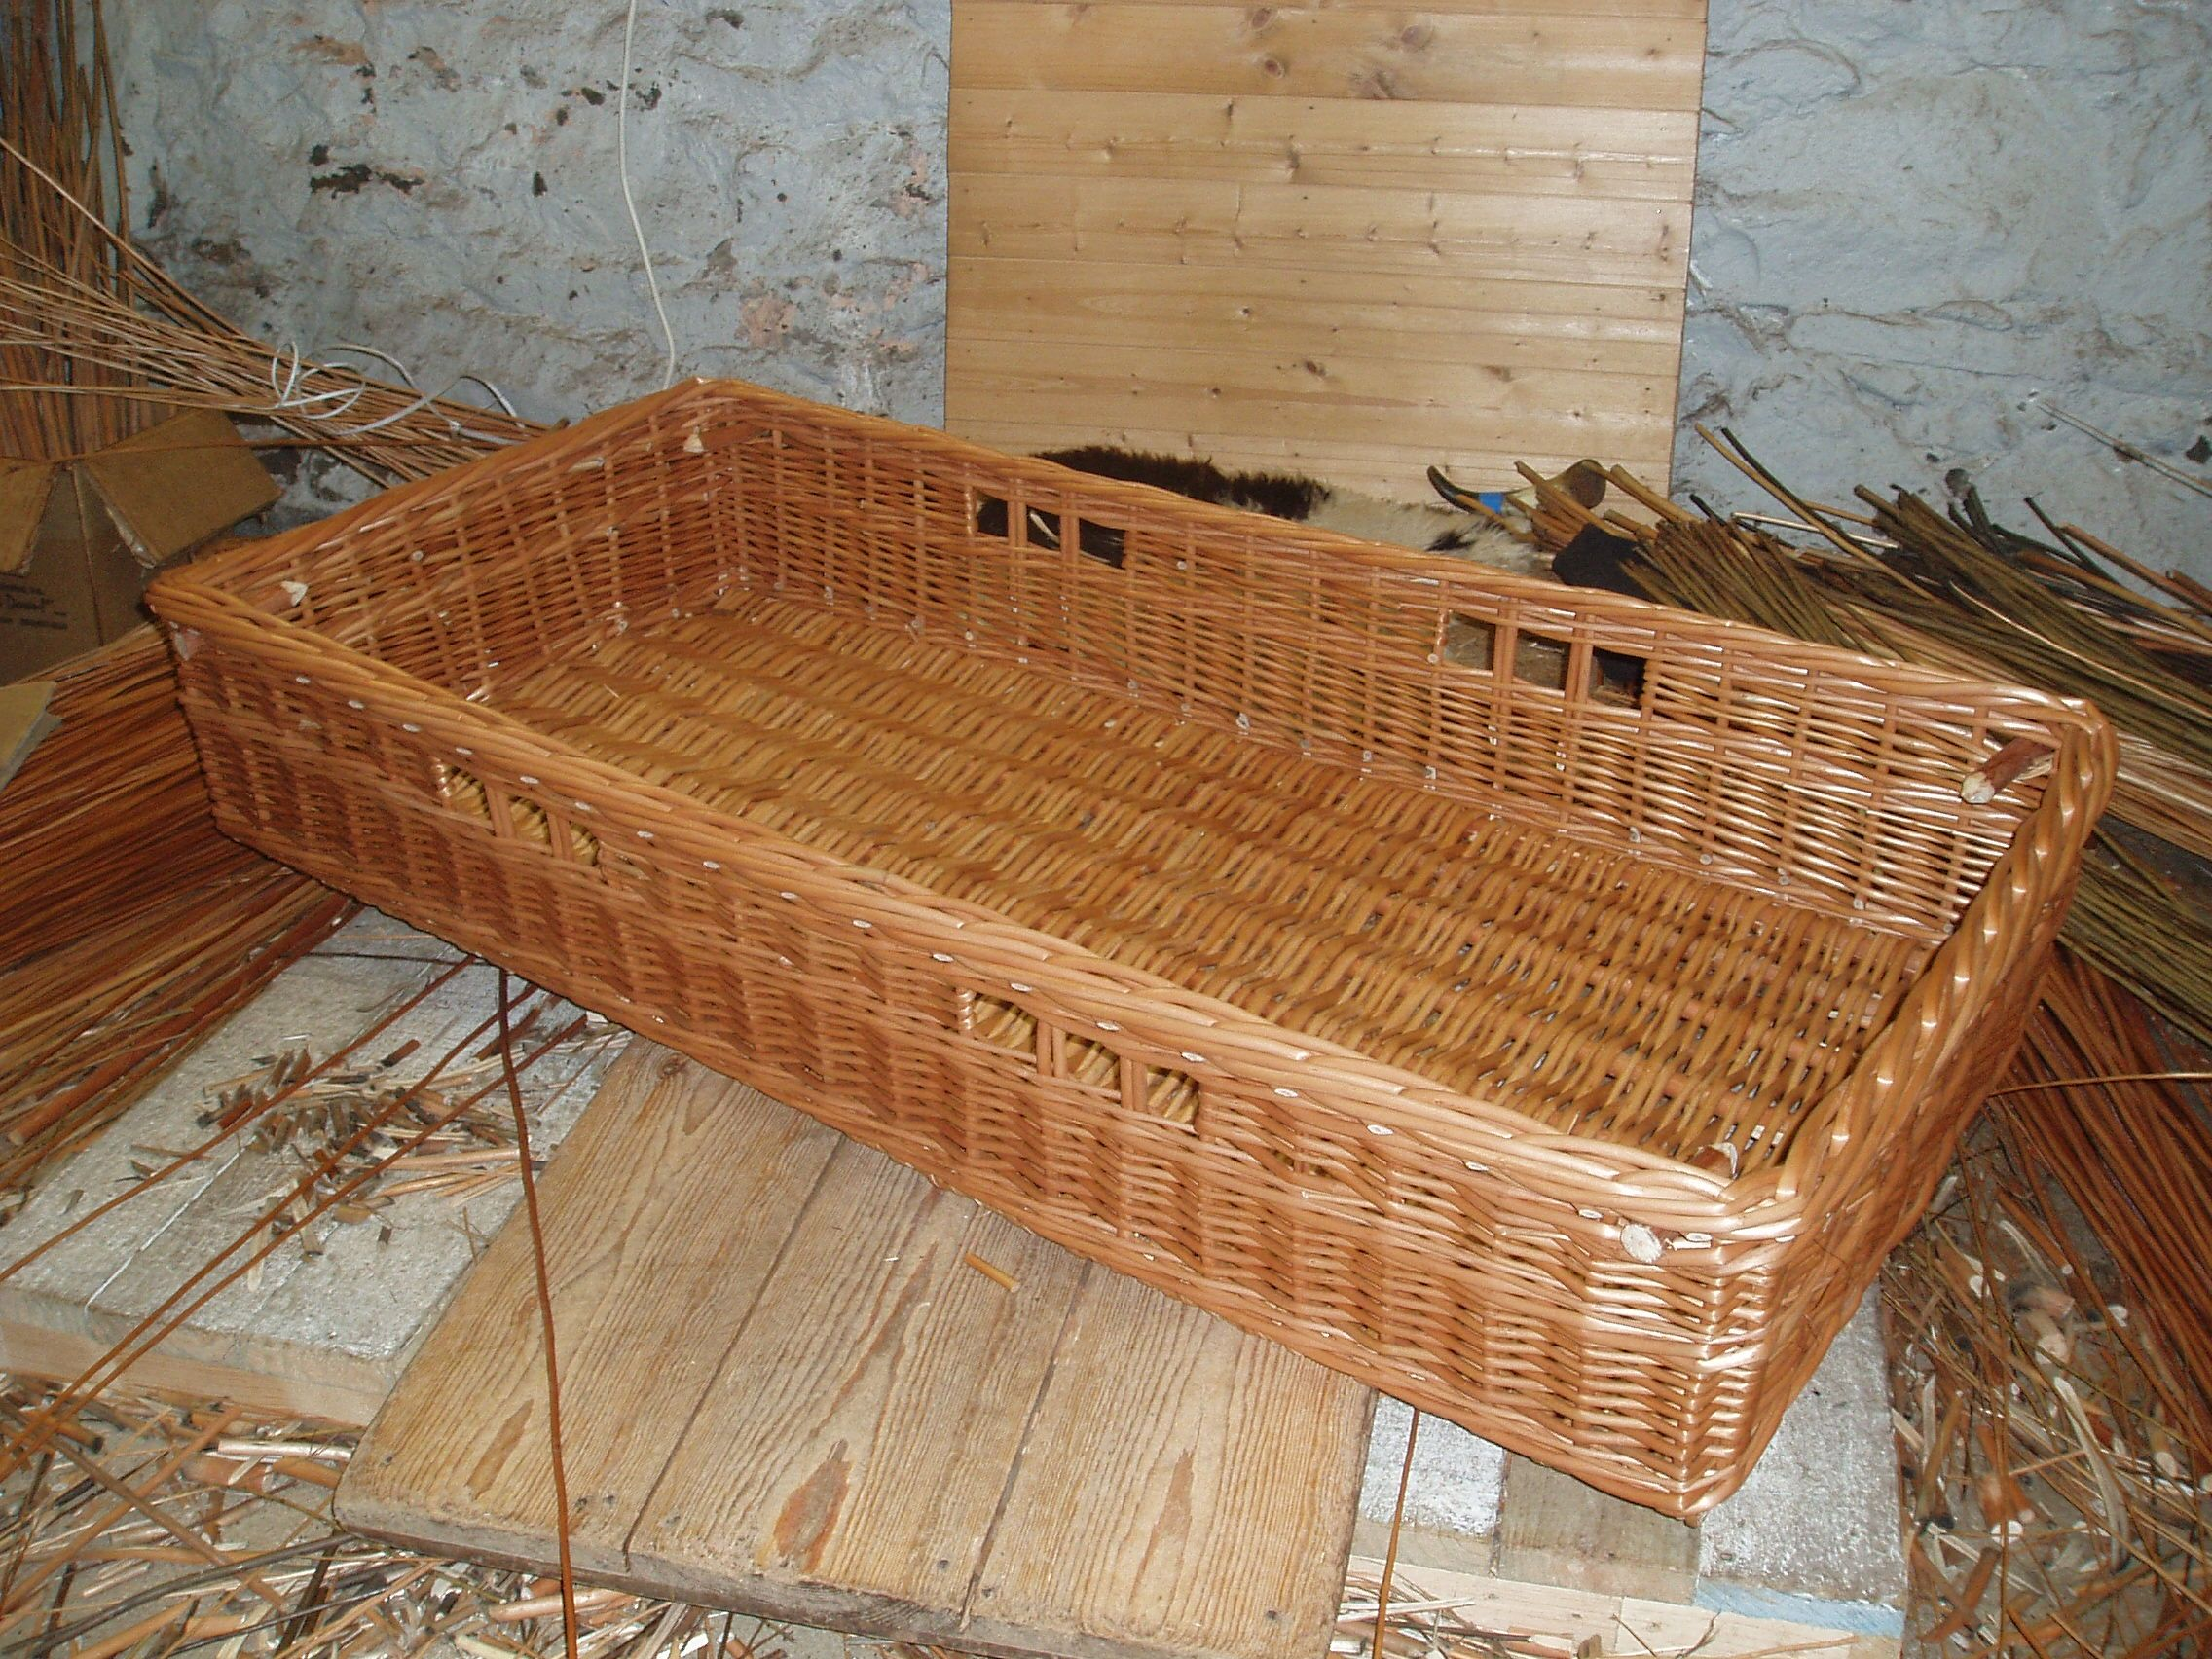 Large Rectangular Basket For Storage Under A Bench On A Boat. Weu0027ve  Left 4 Pegs